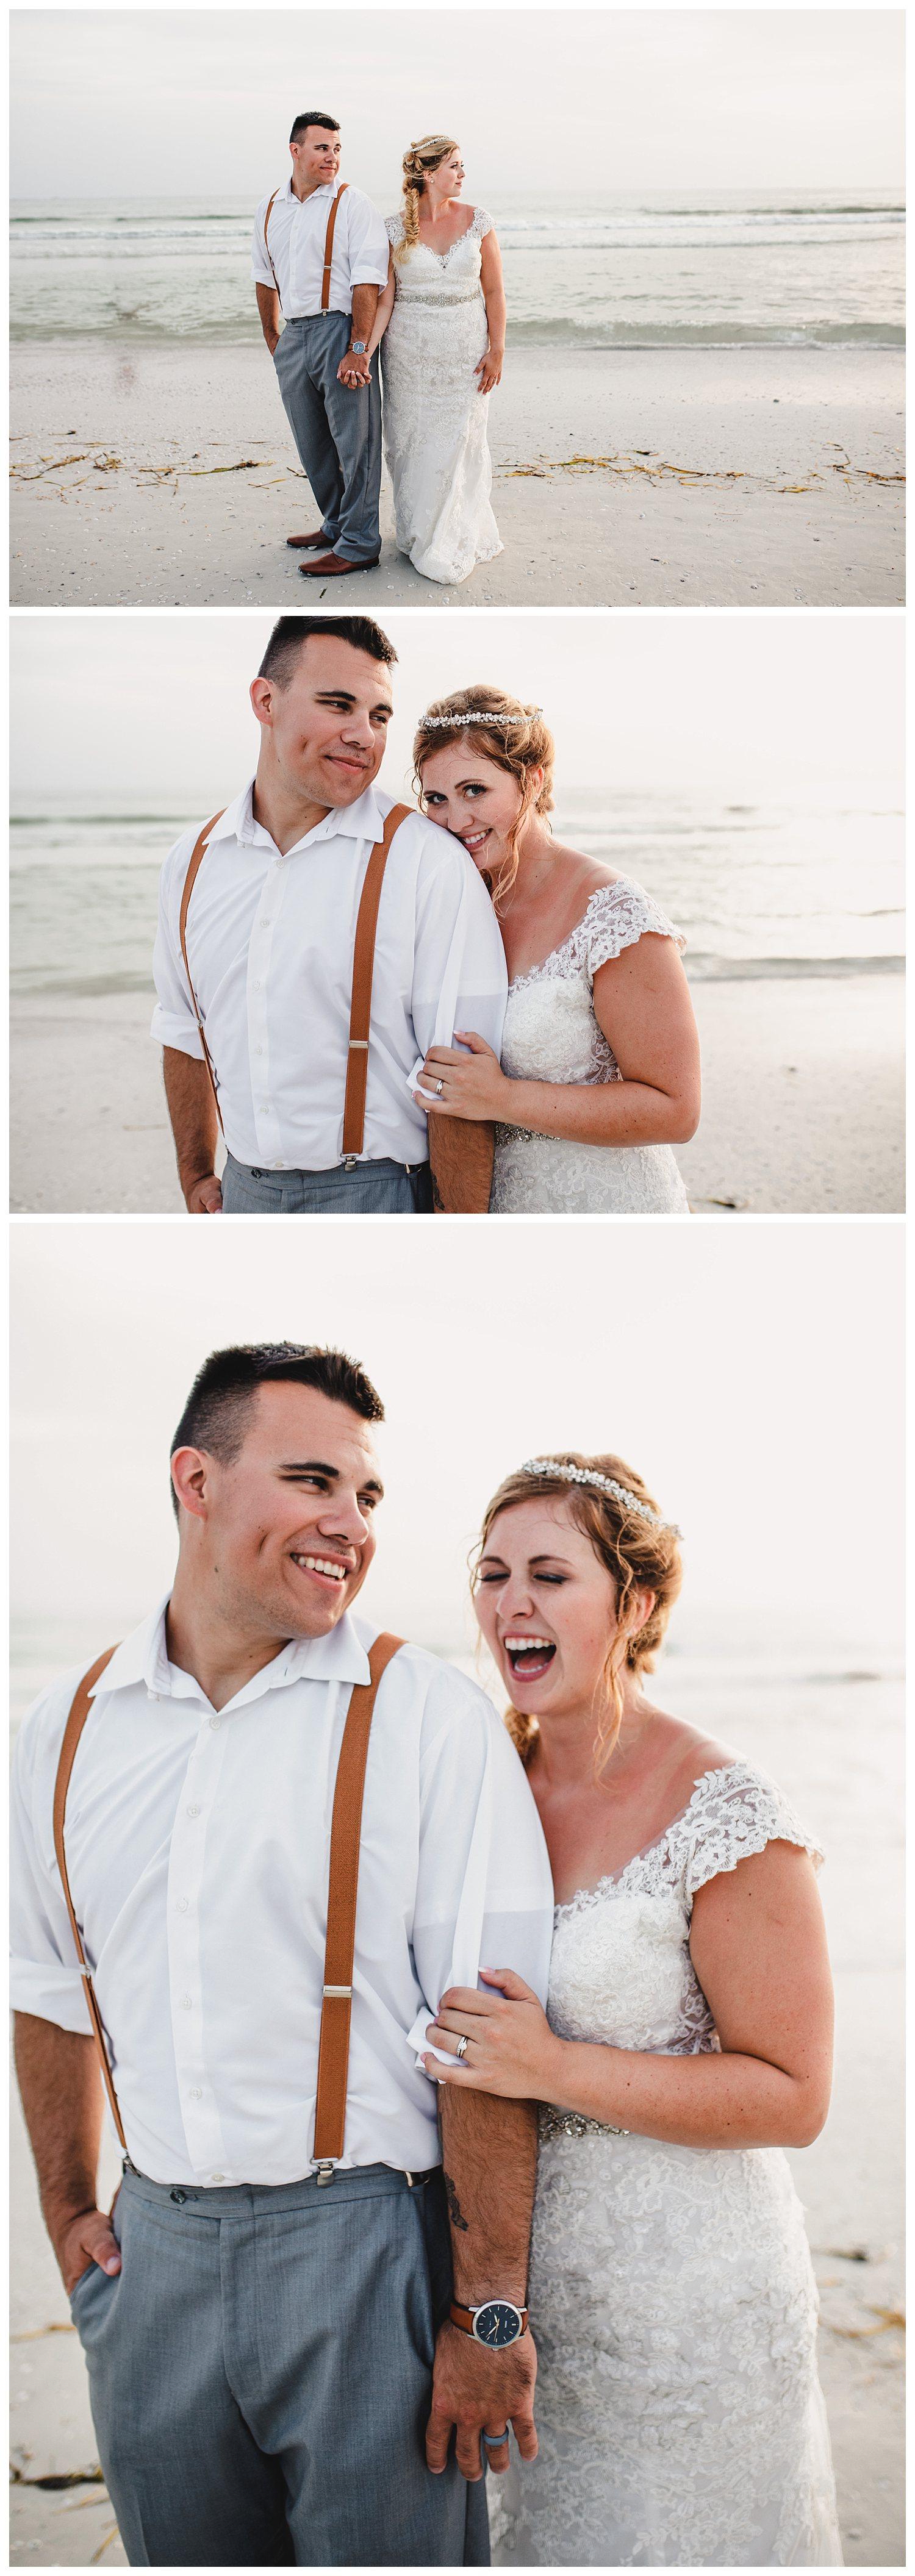 Kelsey_Diane_Photography_Destination_Wedding_Sarasota_Florida_Beach_Wedding_Alex_Austin_0681.jpg